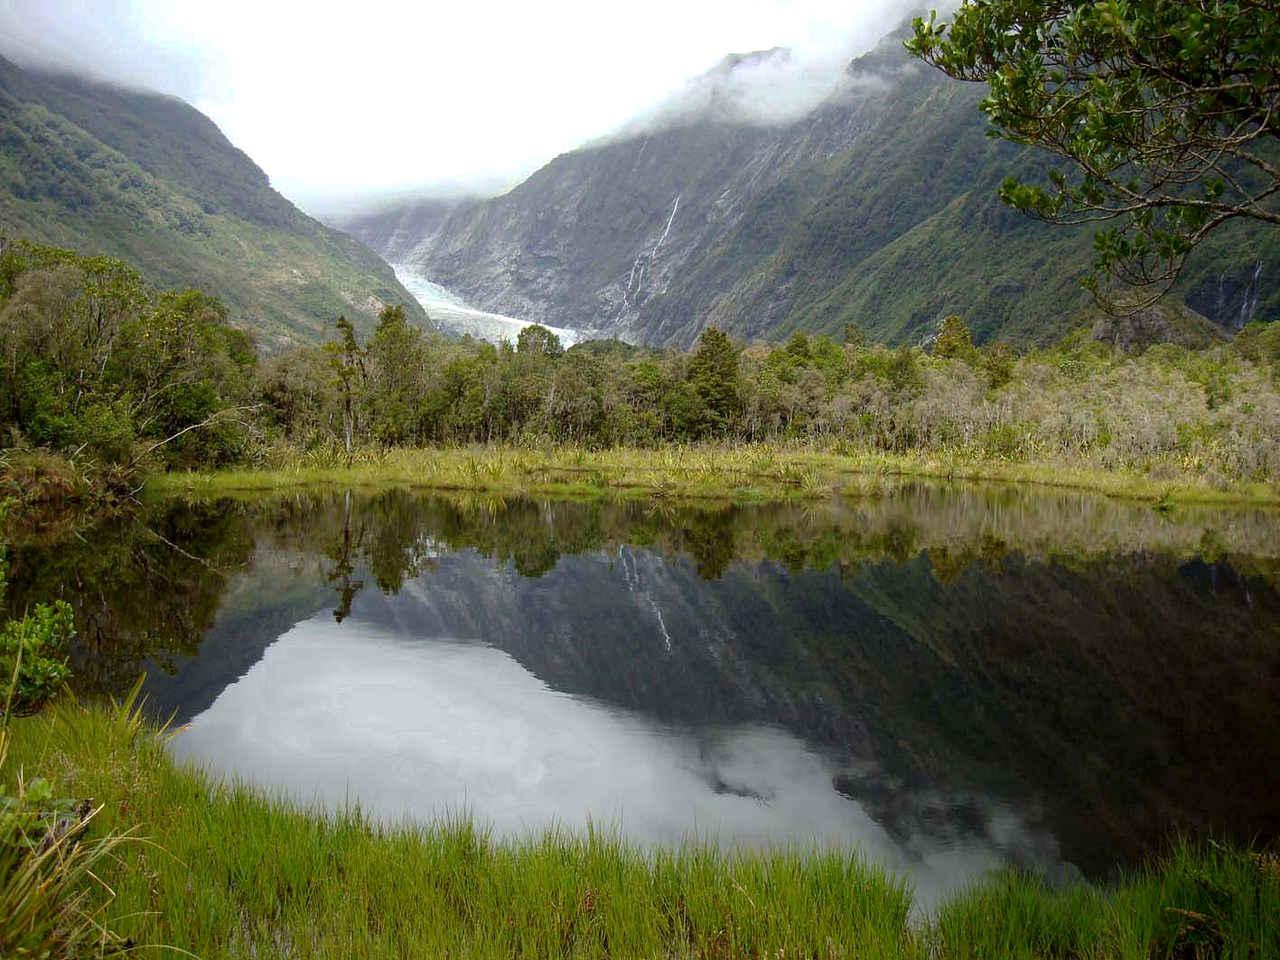 Lake Wombat, New Zealand @TripAdvisor